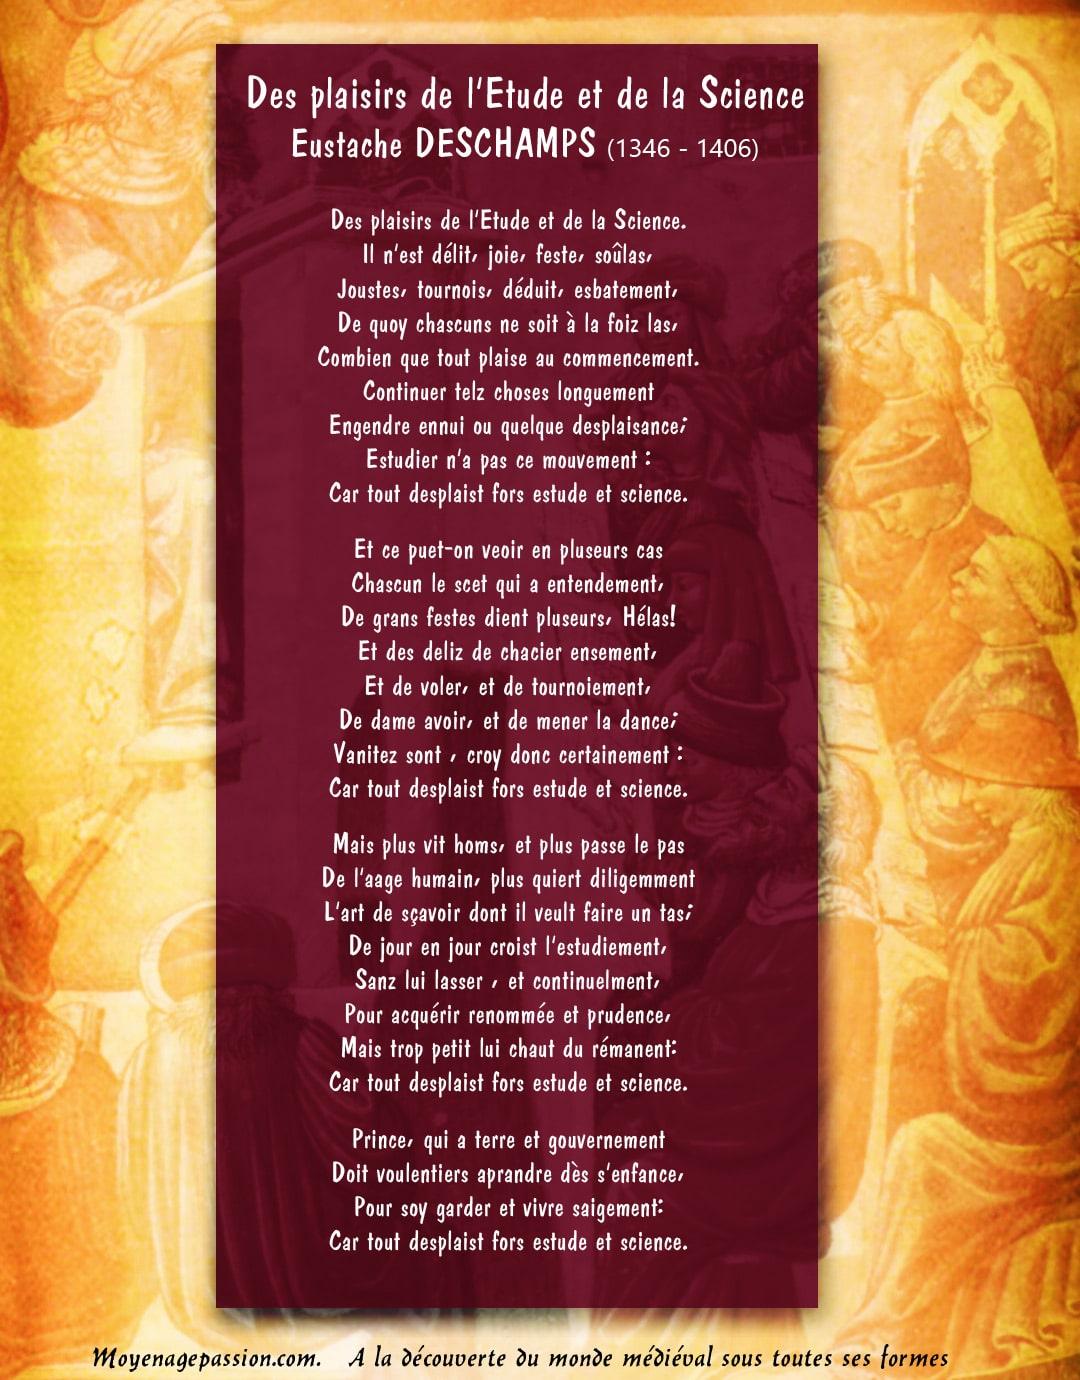 poesie_medievale_ballade_eustache_deschamps_universite_etude_sciences_moyen_age